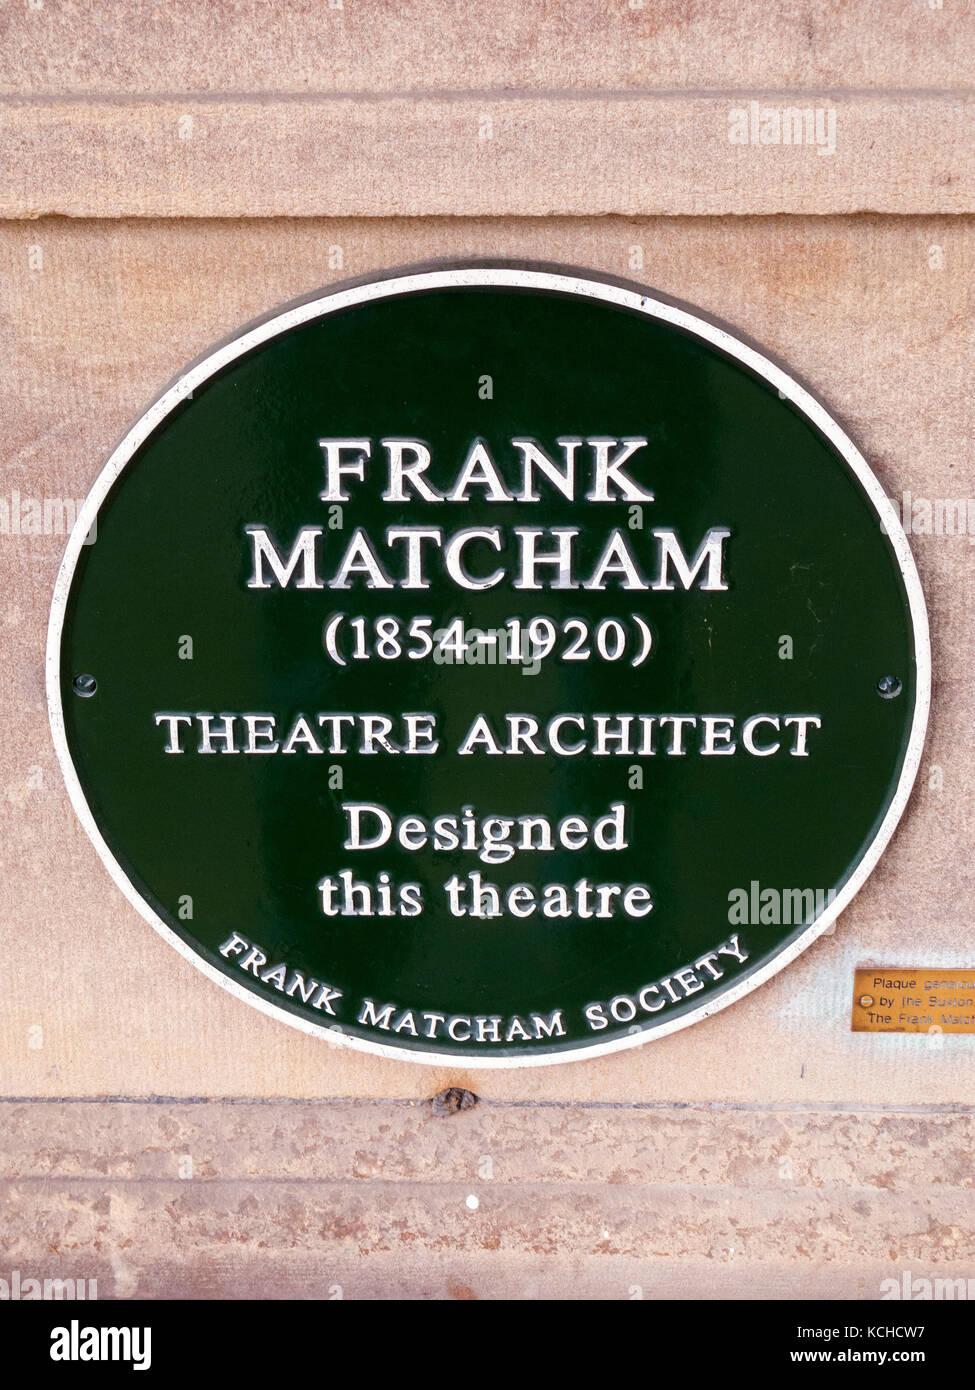 Frank Matcham,theatre architect, Wall Plaque, Buxton Opera House, Buxton, Derbyshire - Stock Image